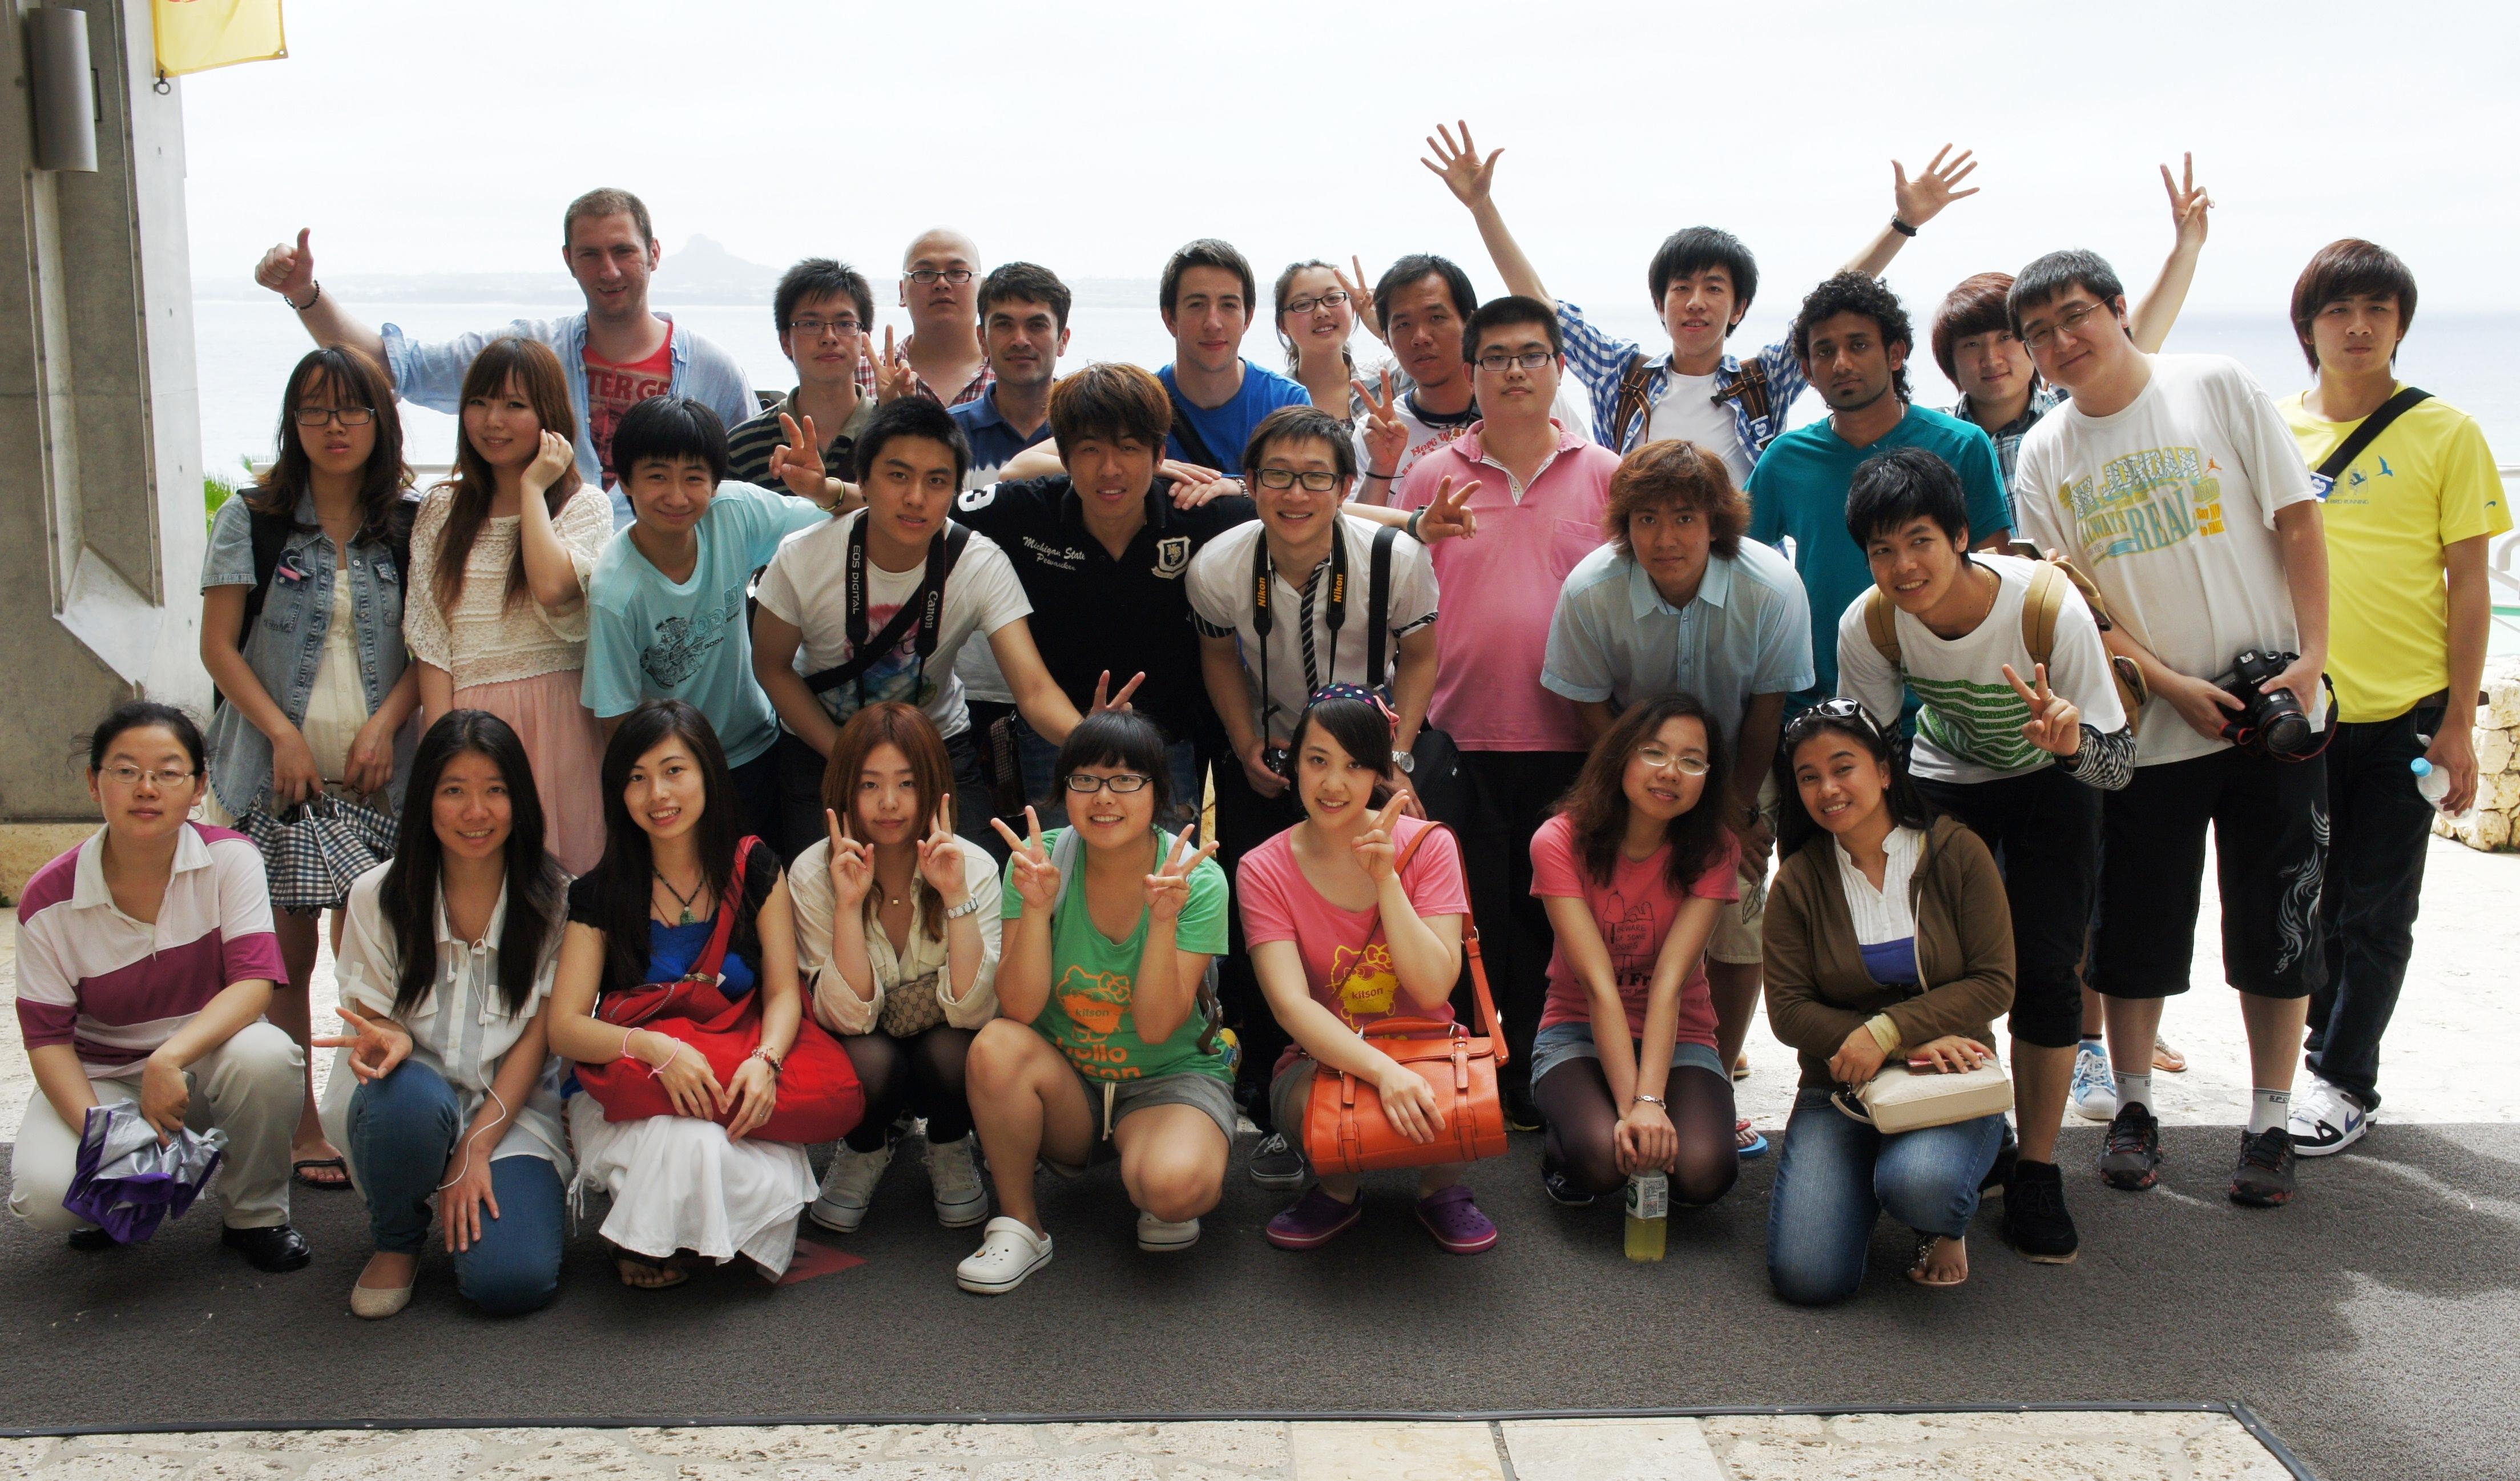 pimpandhostcom-net onion {{{~~~ 2 Filename: 沖縄集合写真.JPG